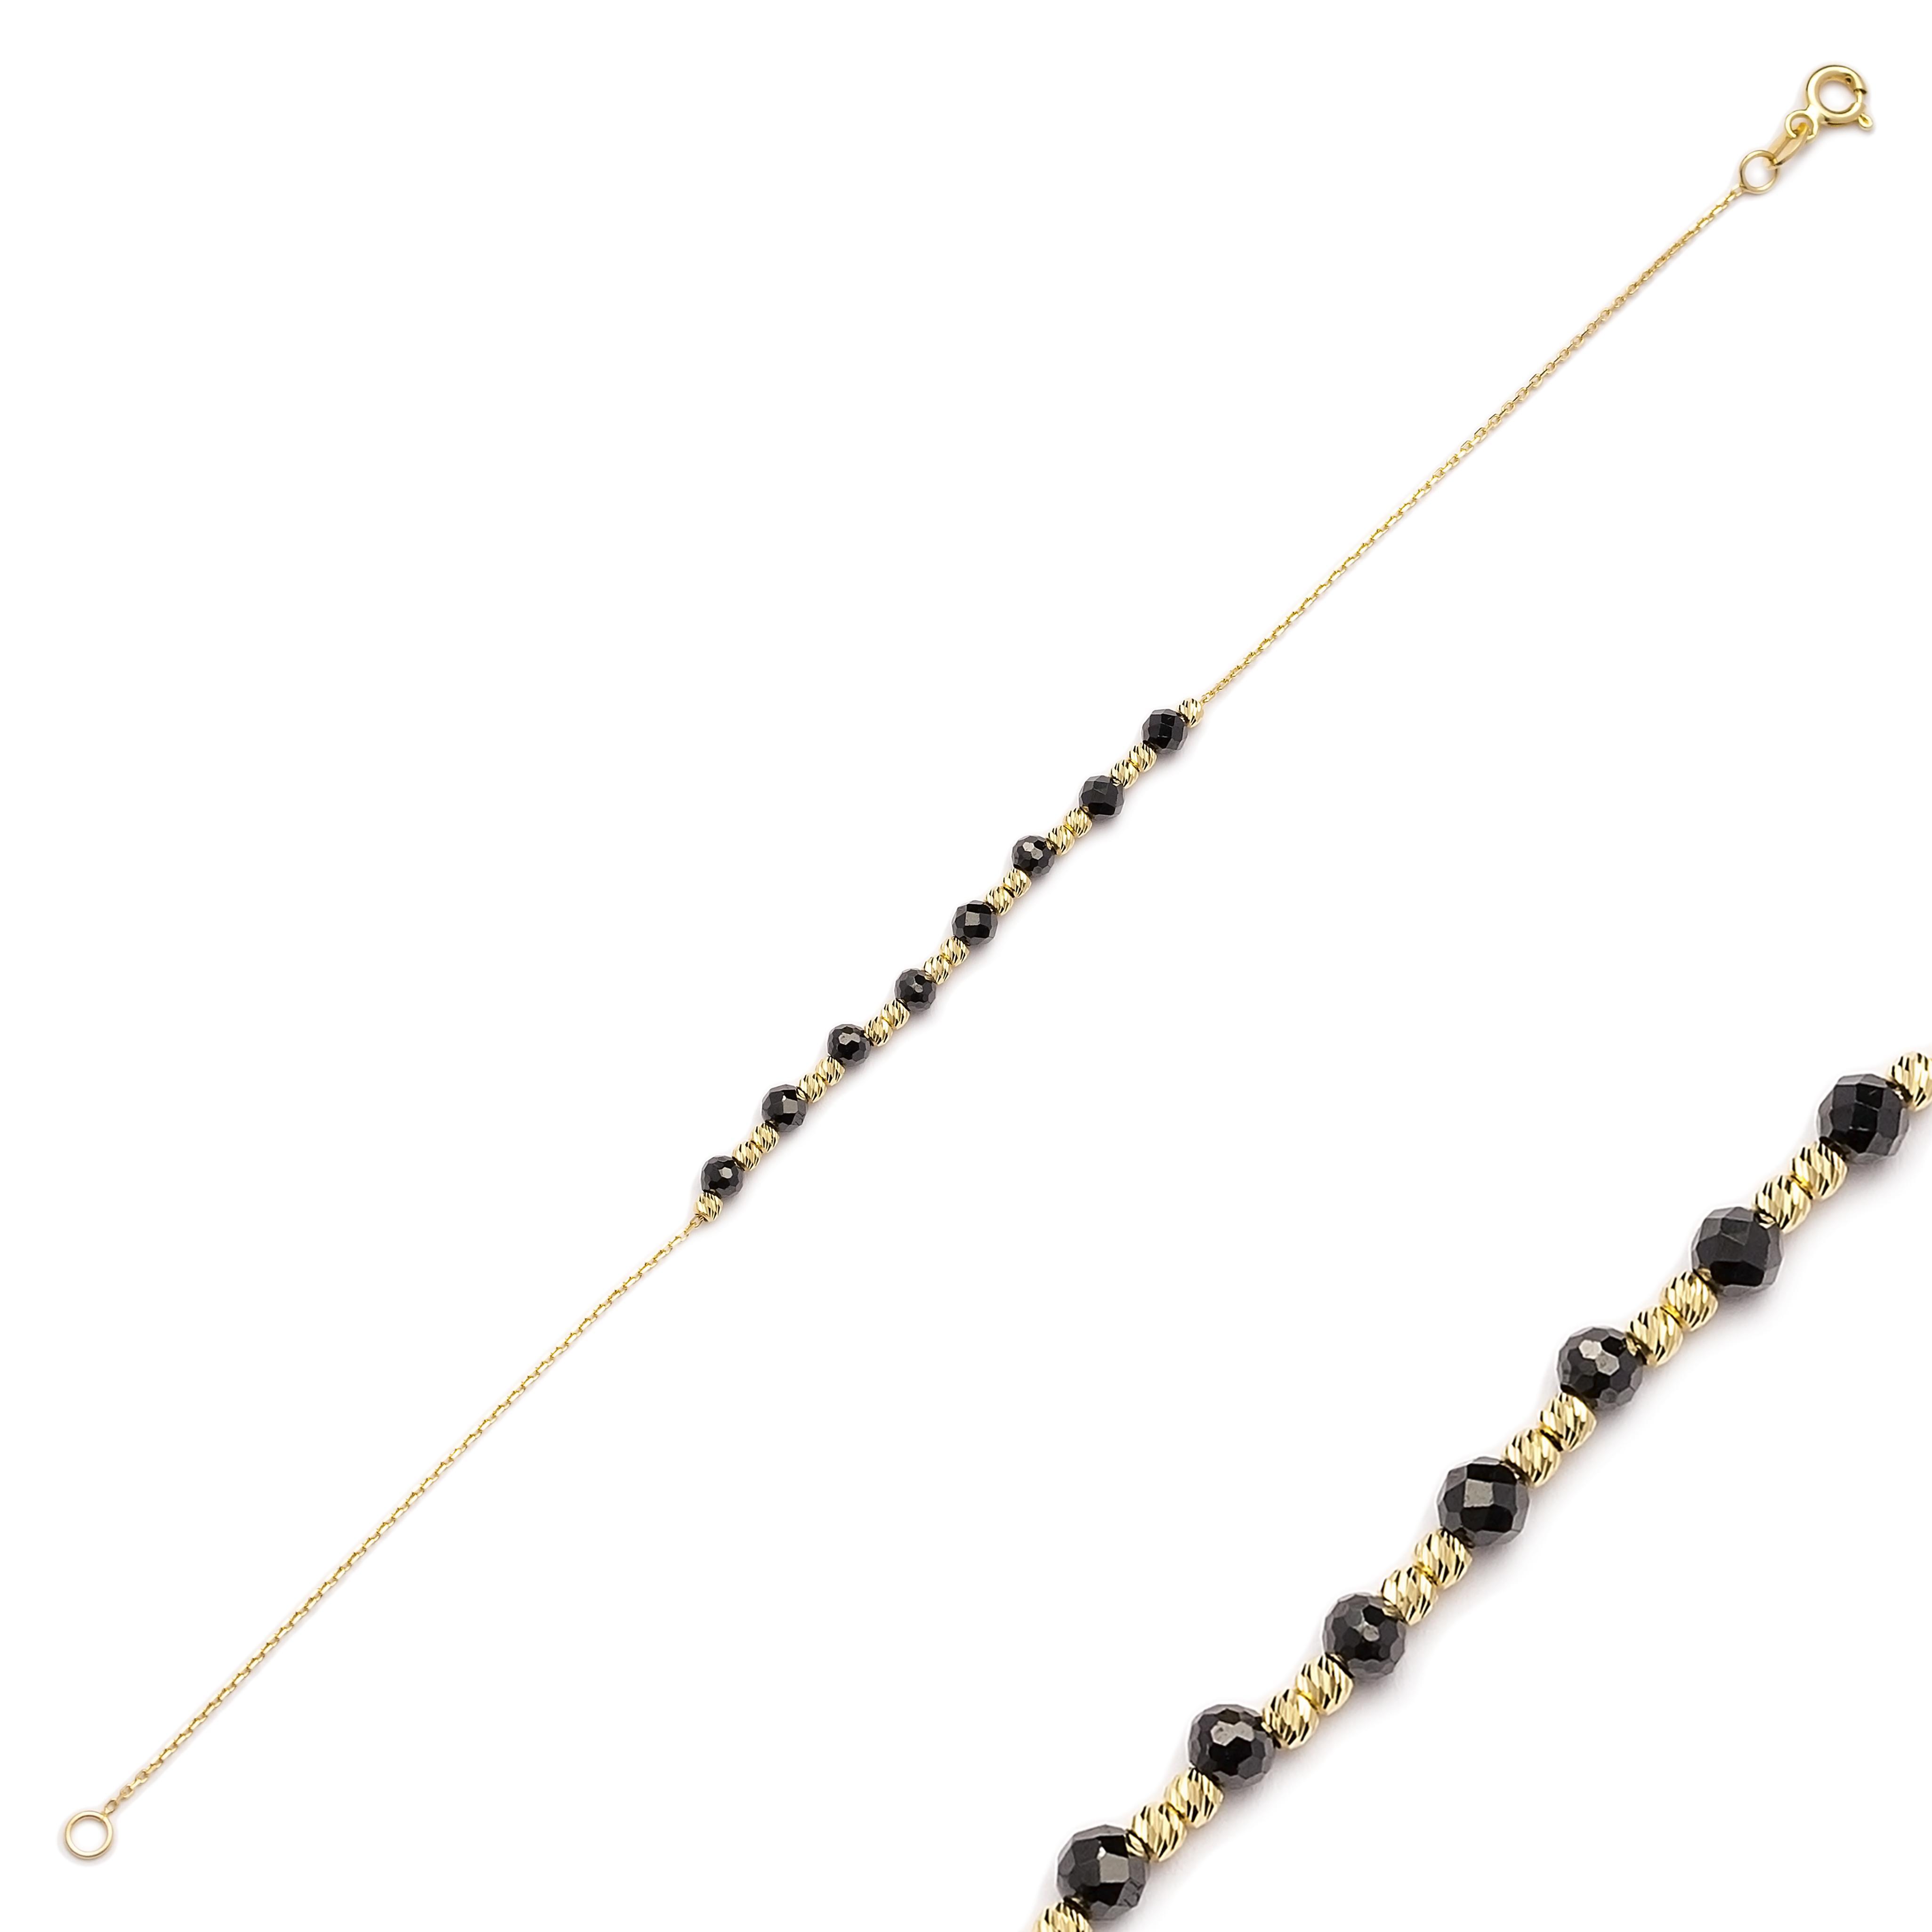 Dainty Elegant Turkish Wholesale 14k Gold Bracelet